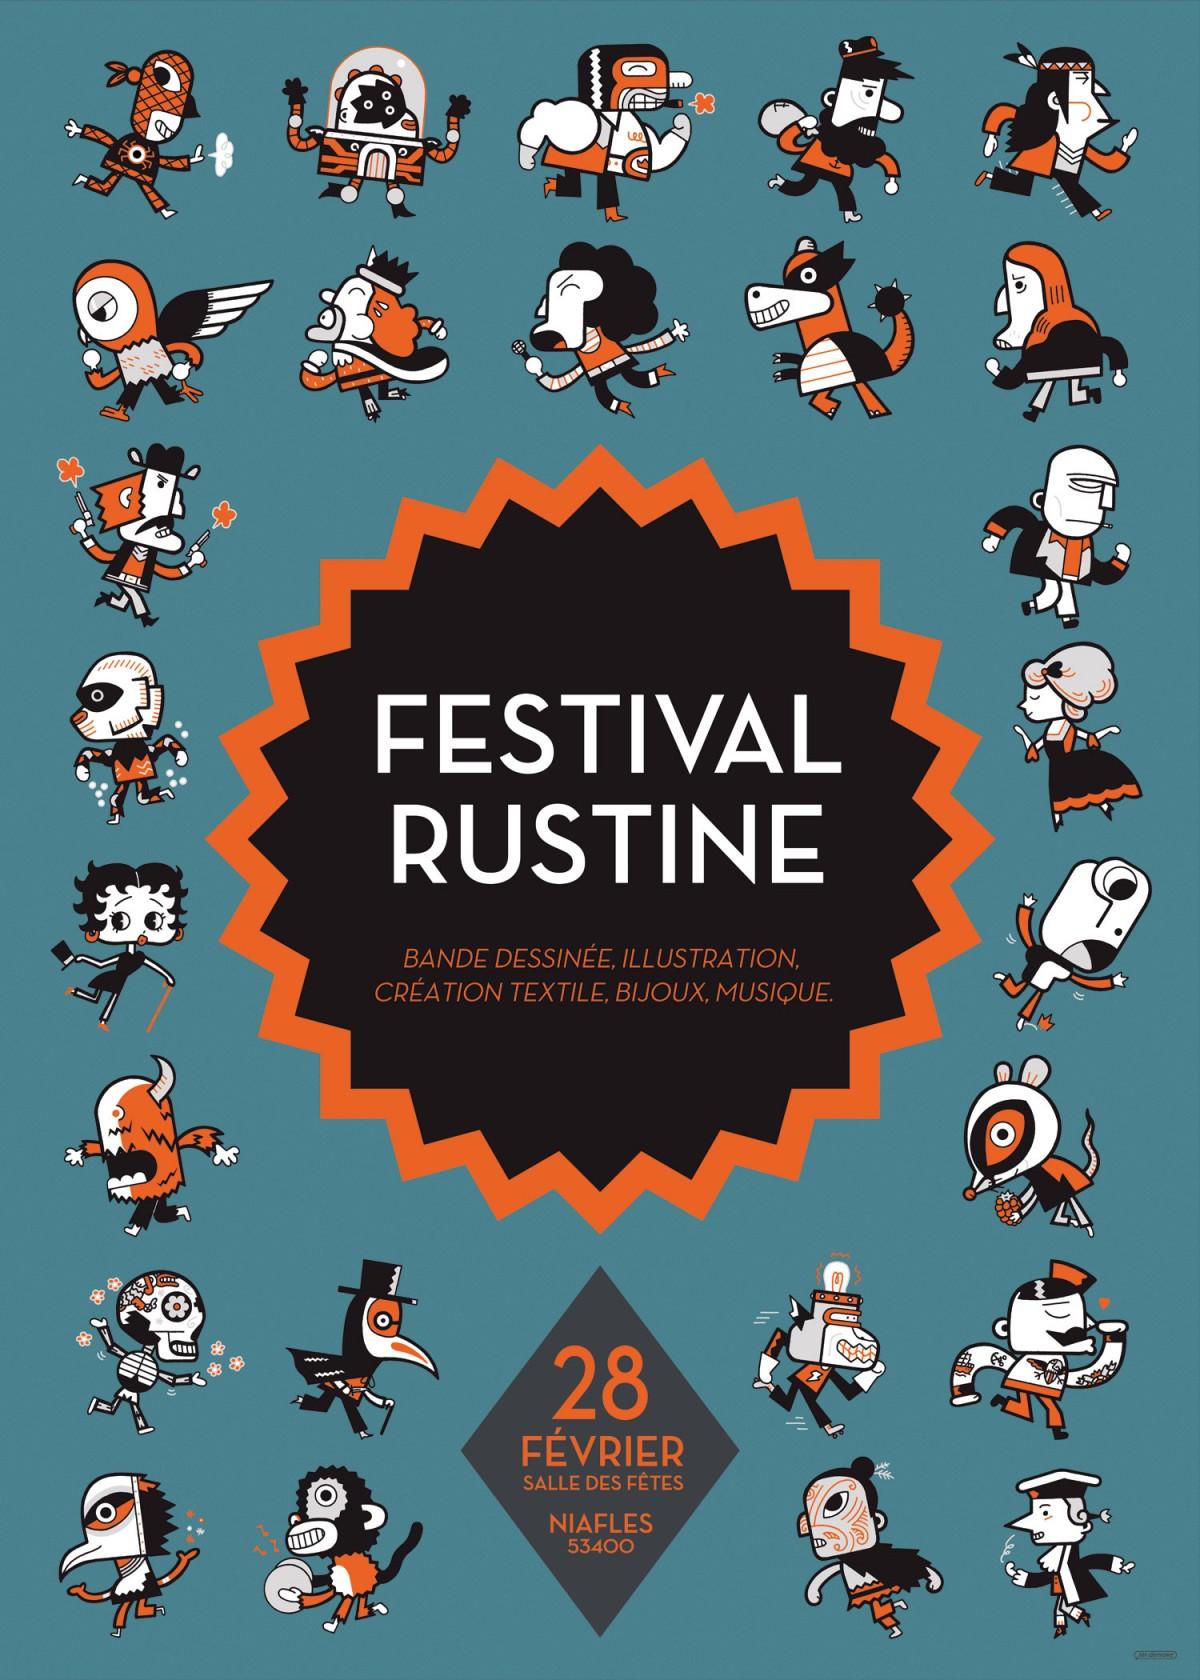 Mathieu Demore, Illustration jeunesse et Bande-dessinée Festival Rustine 2015